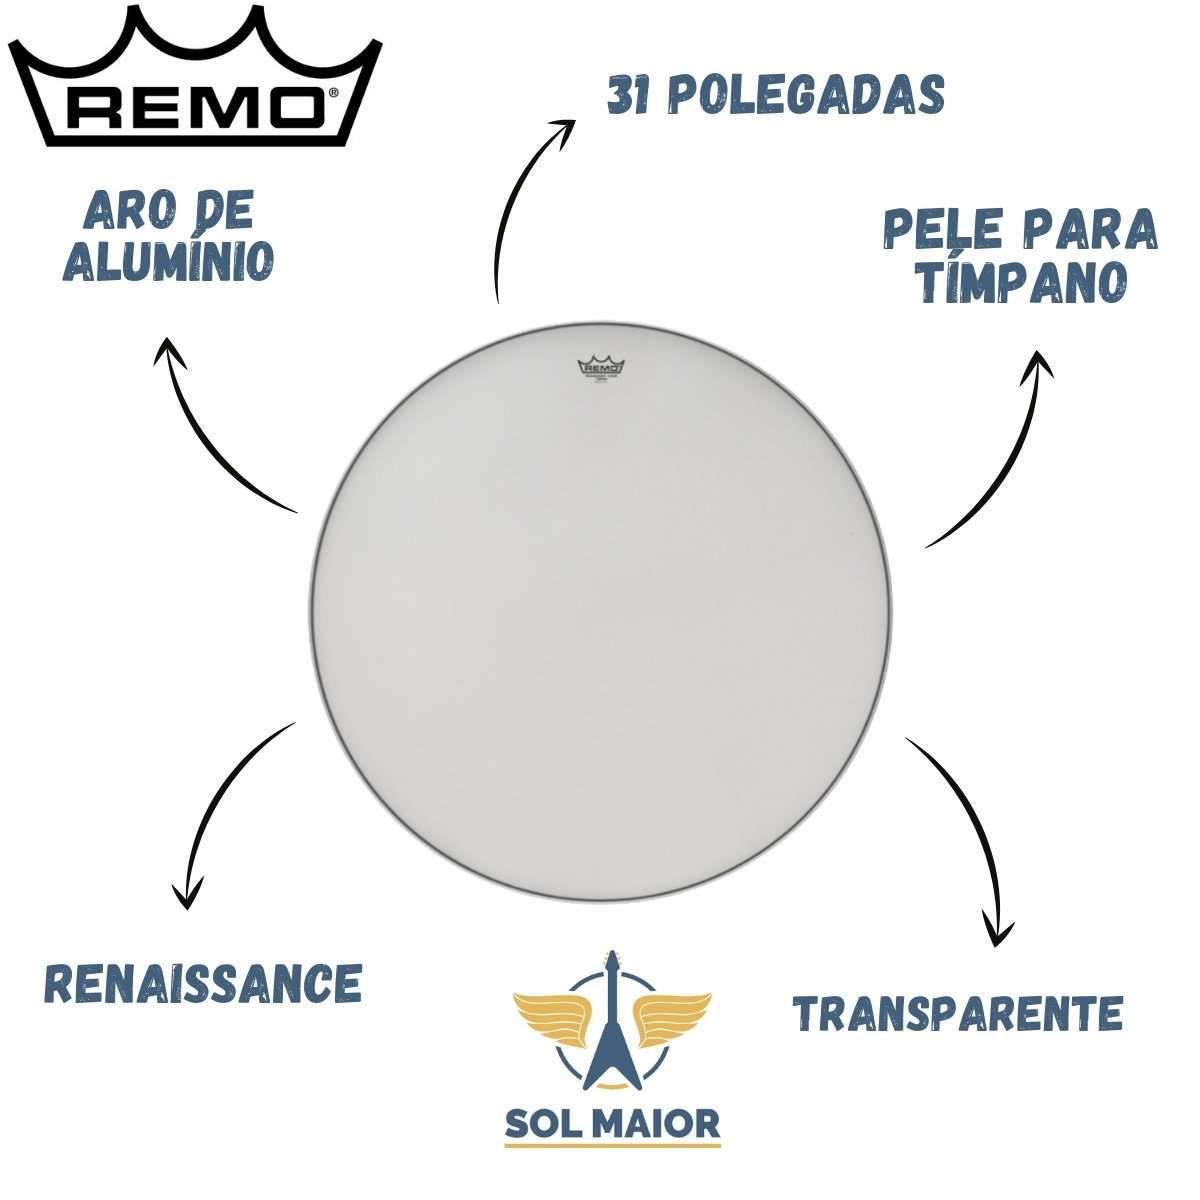 "Pele Remo Tímpano 31"" Renaissance Transparente Aro Alumínio"